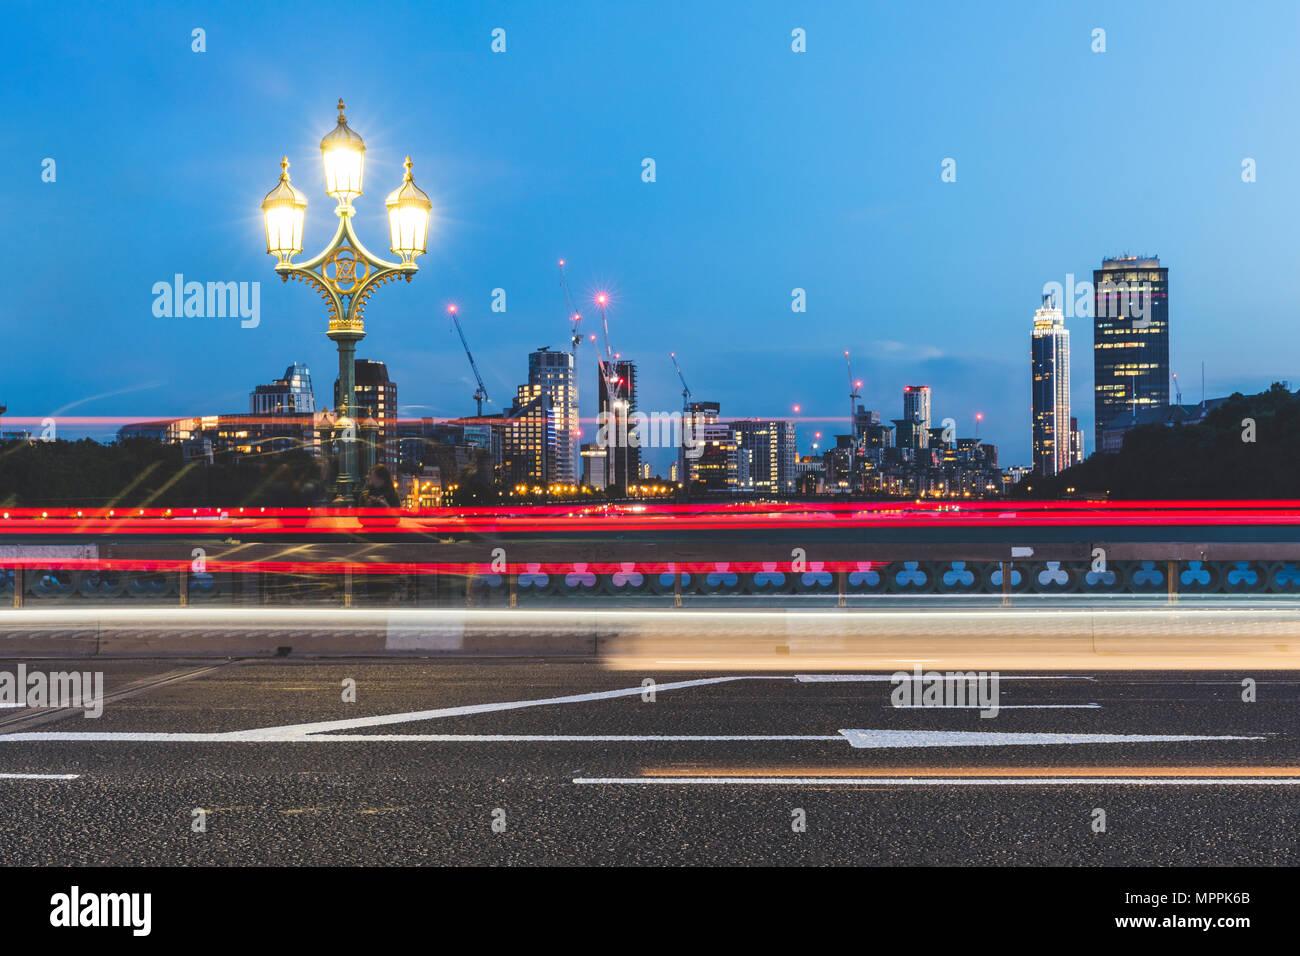 UK, London, traffic light trails on Westminster Bridge at dusk Stock Photo